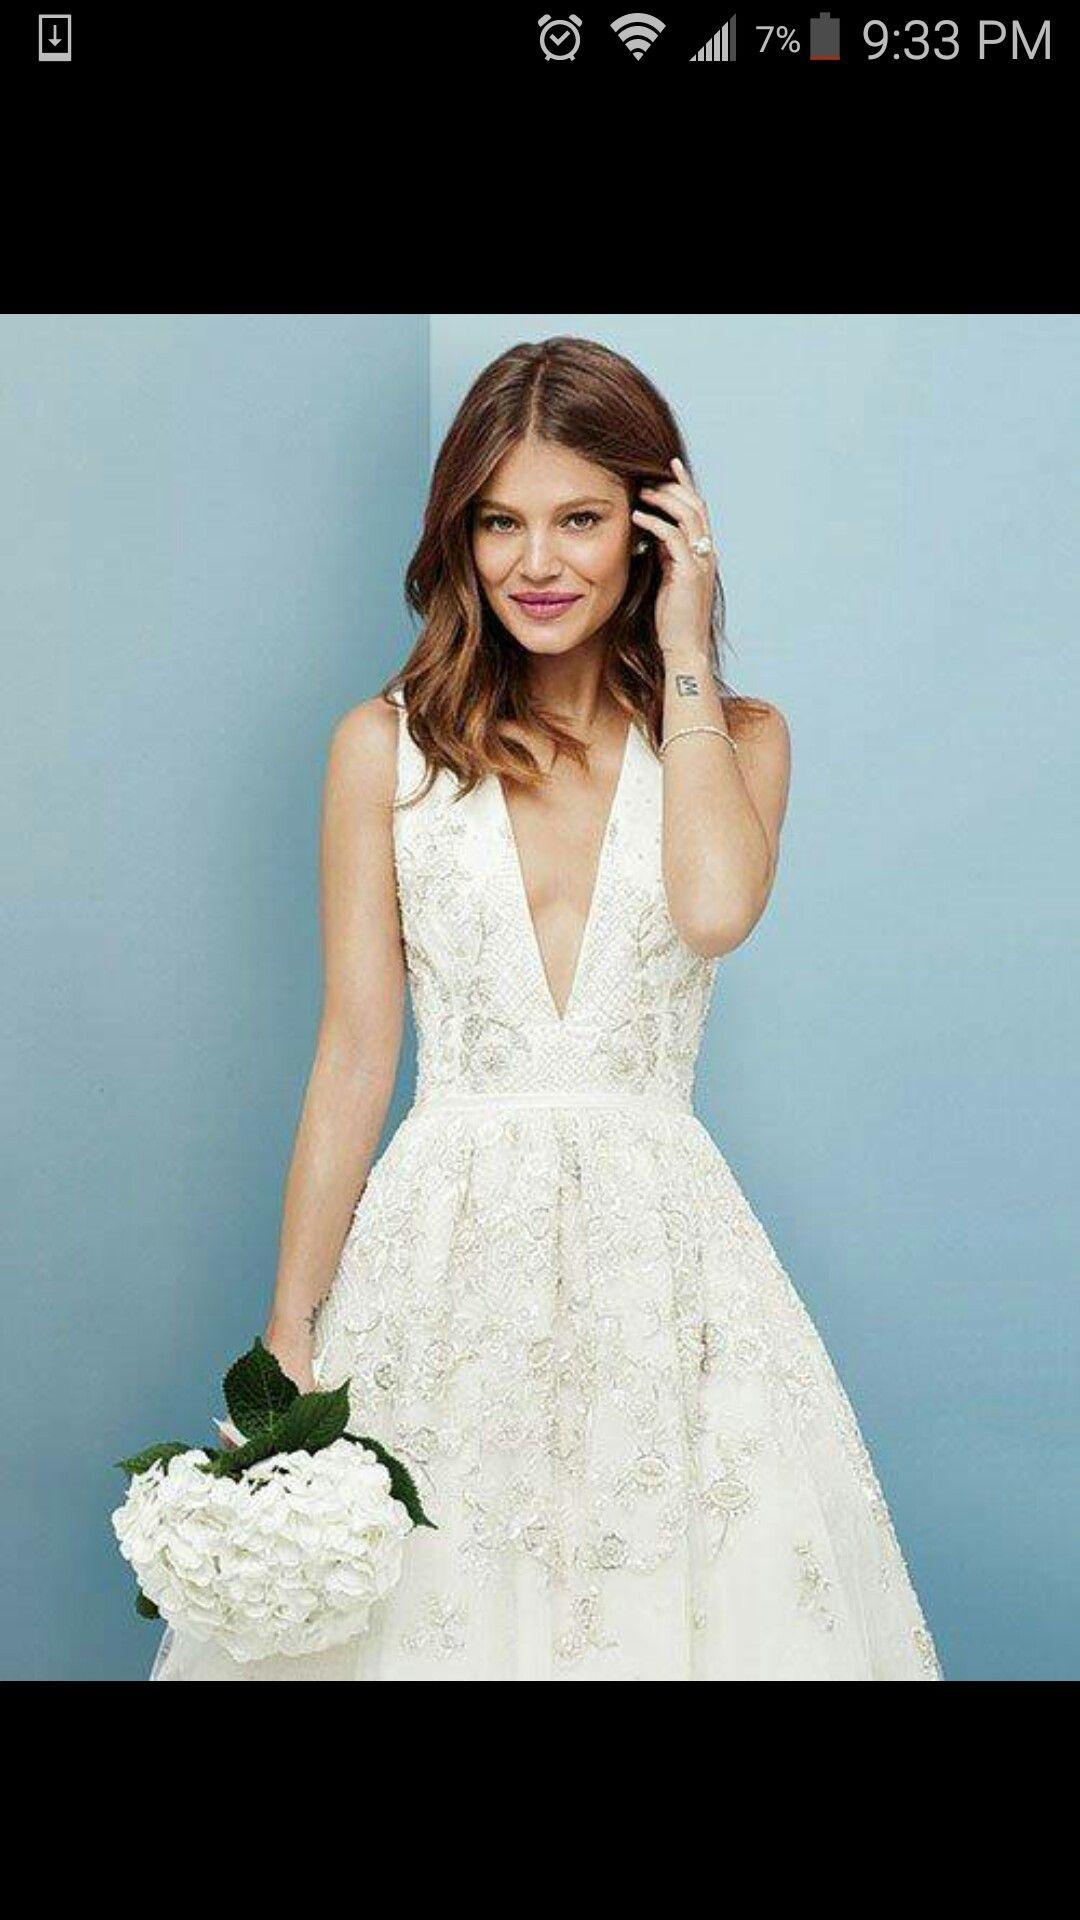 Pin de Nalini S en Dress | Pinterest